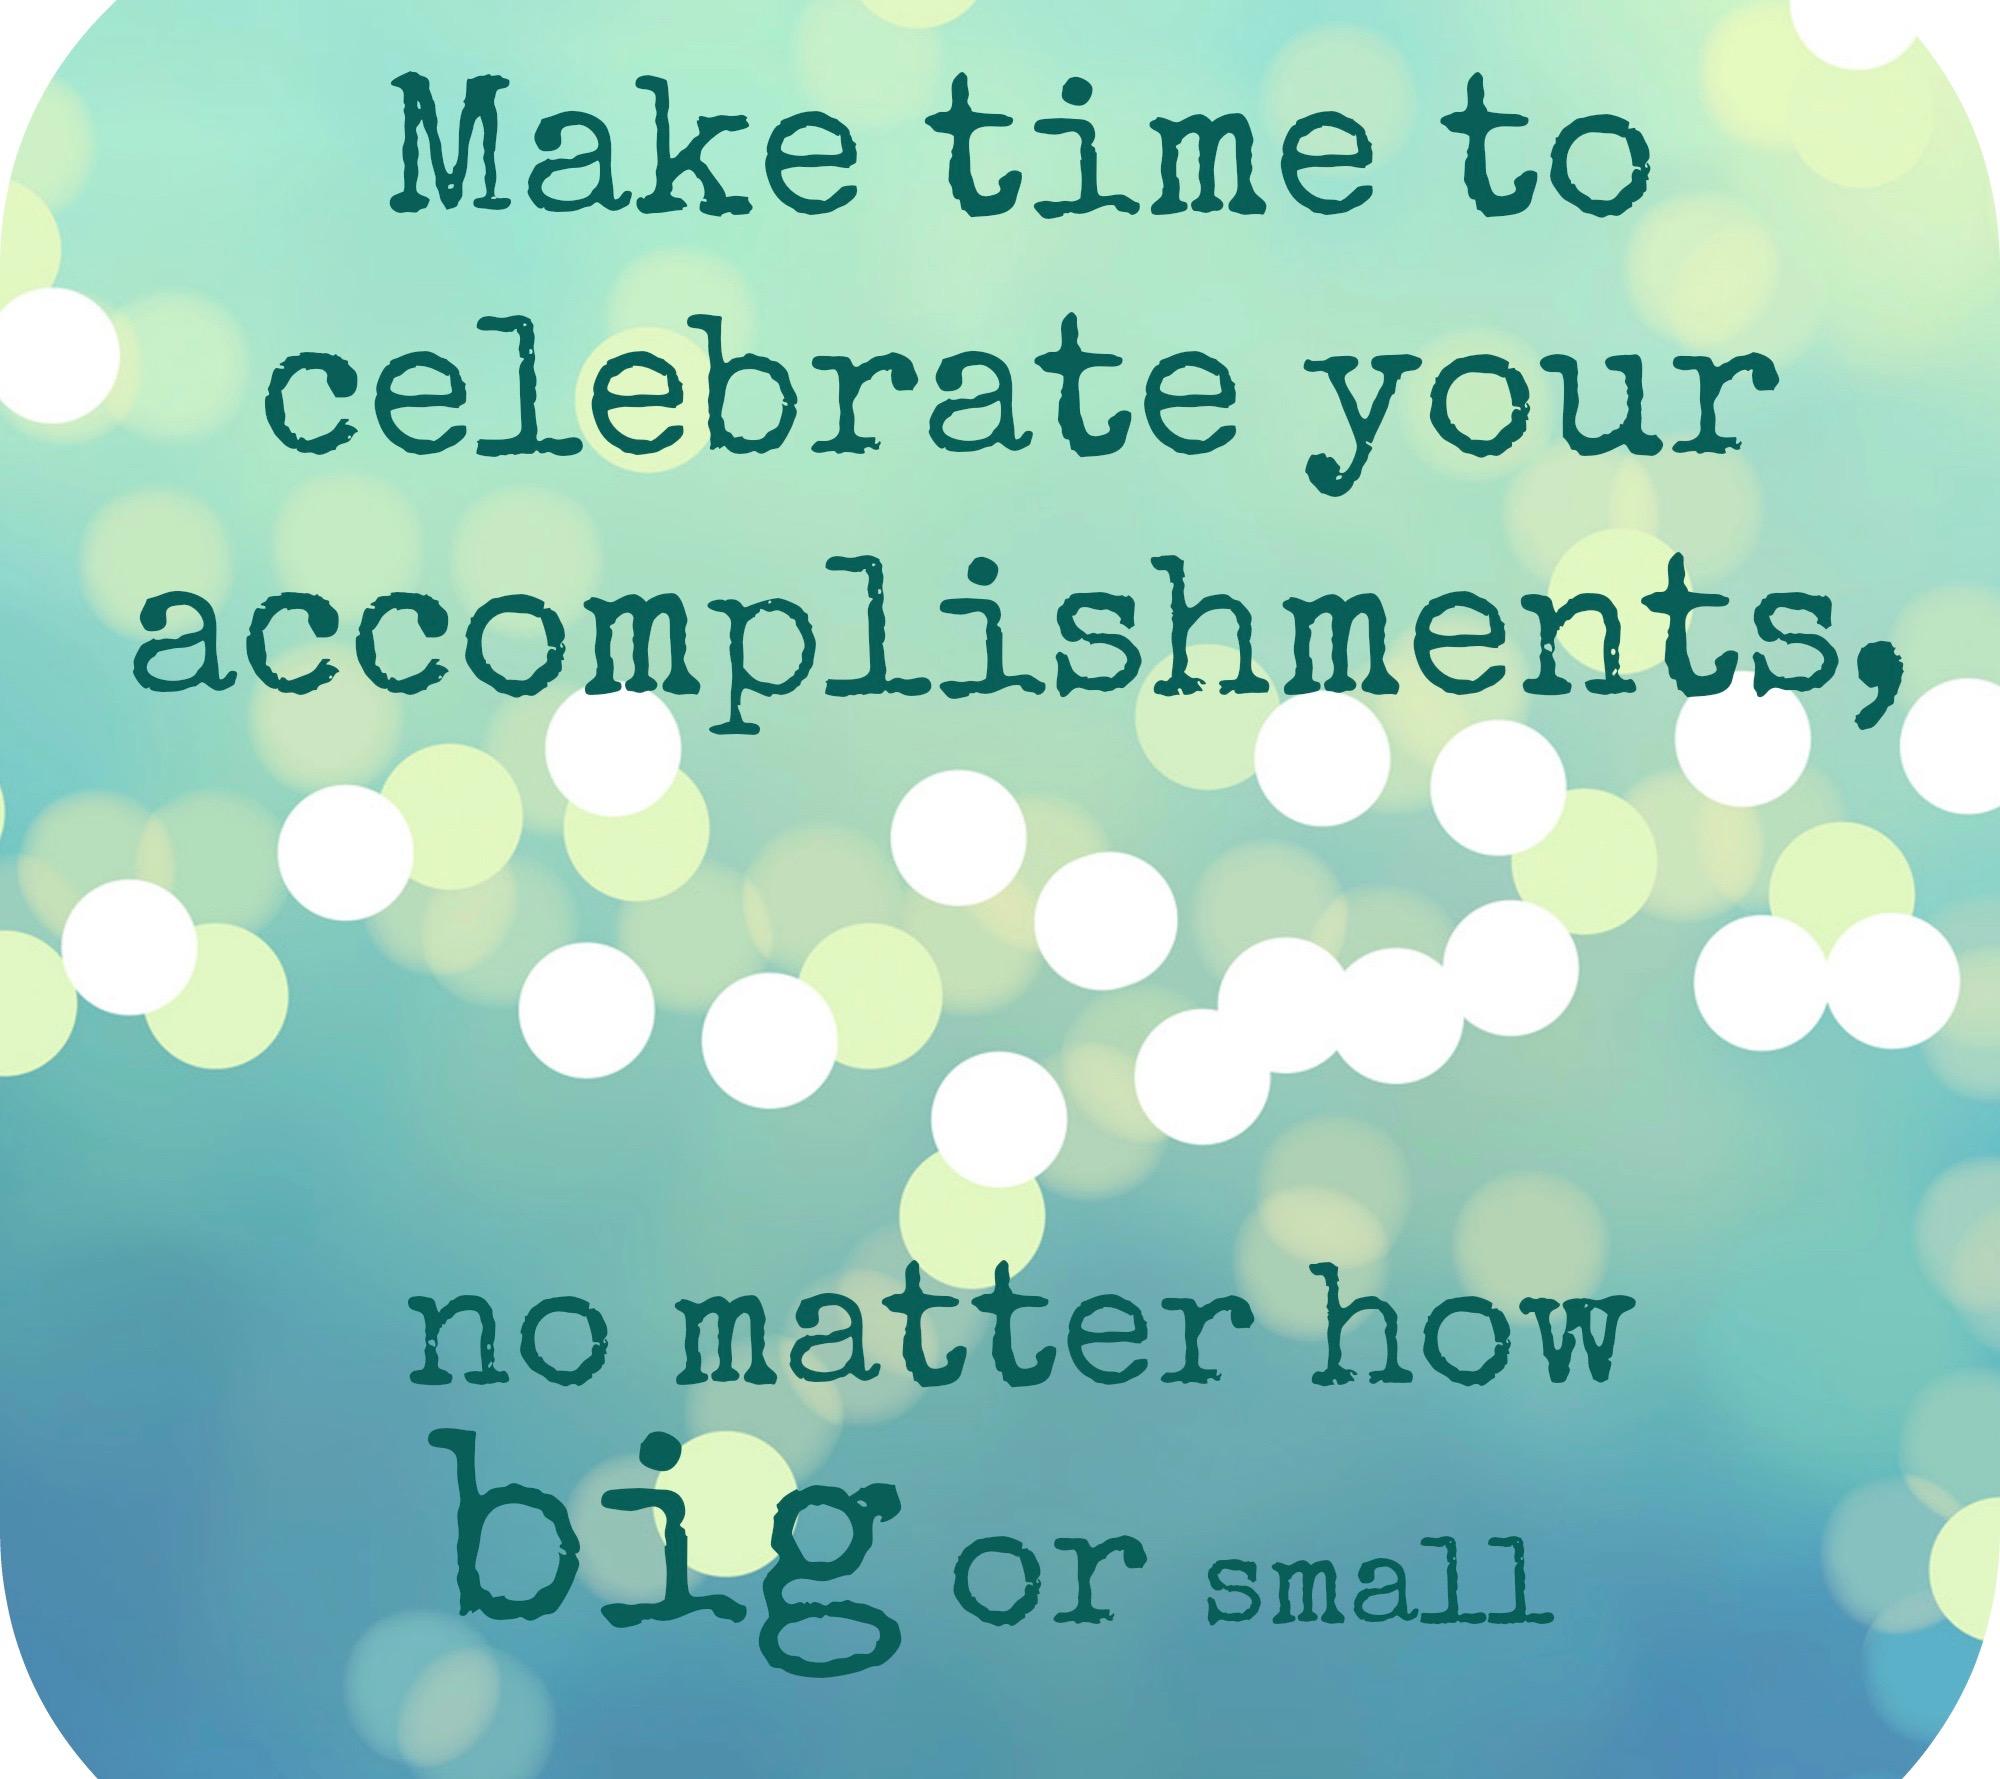 2019 - Celebrate Small Accomplishments Too!!